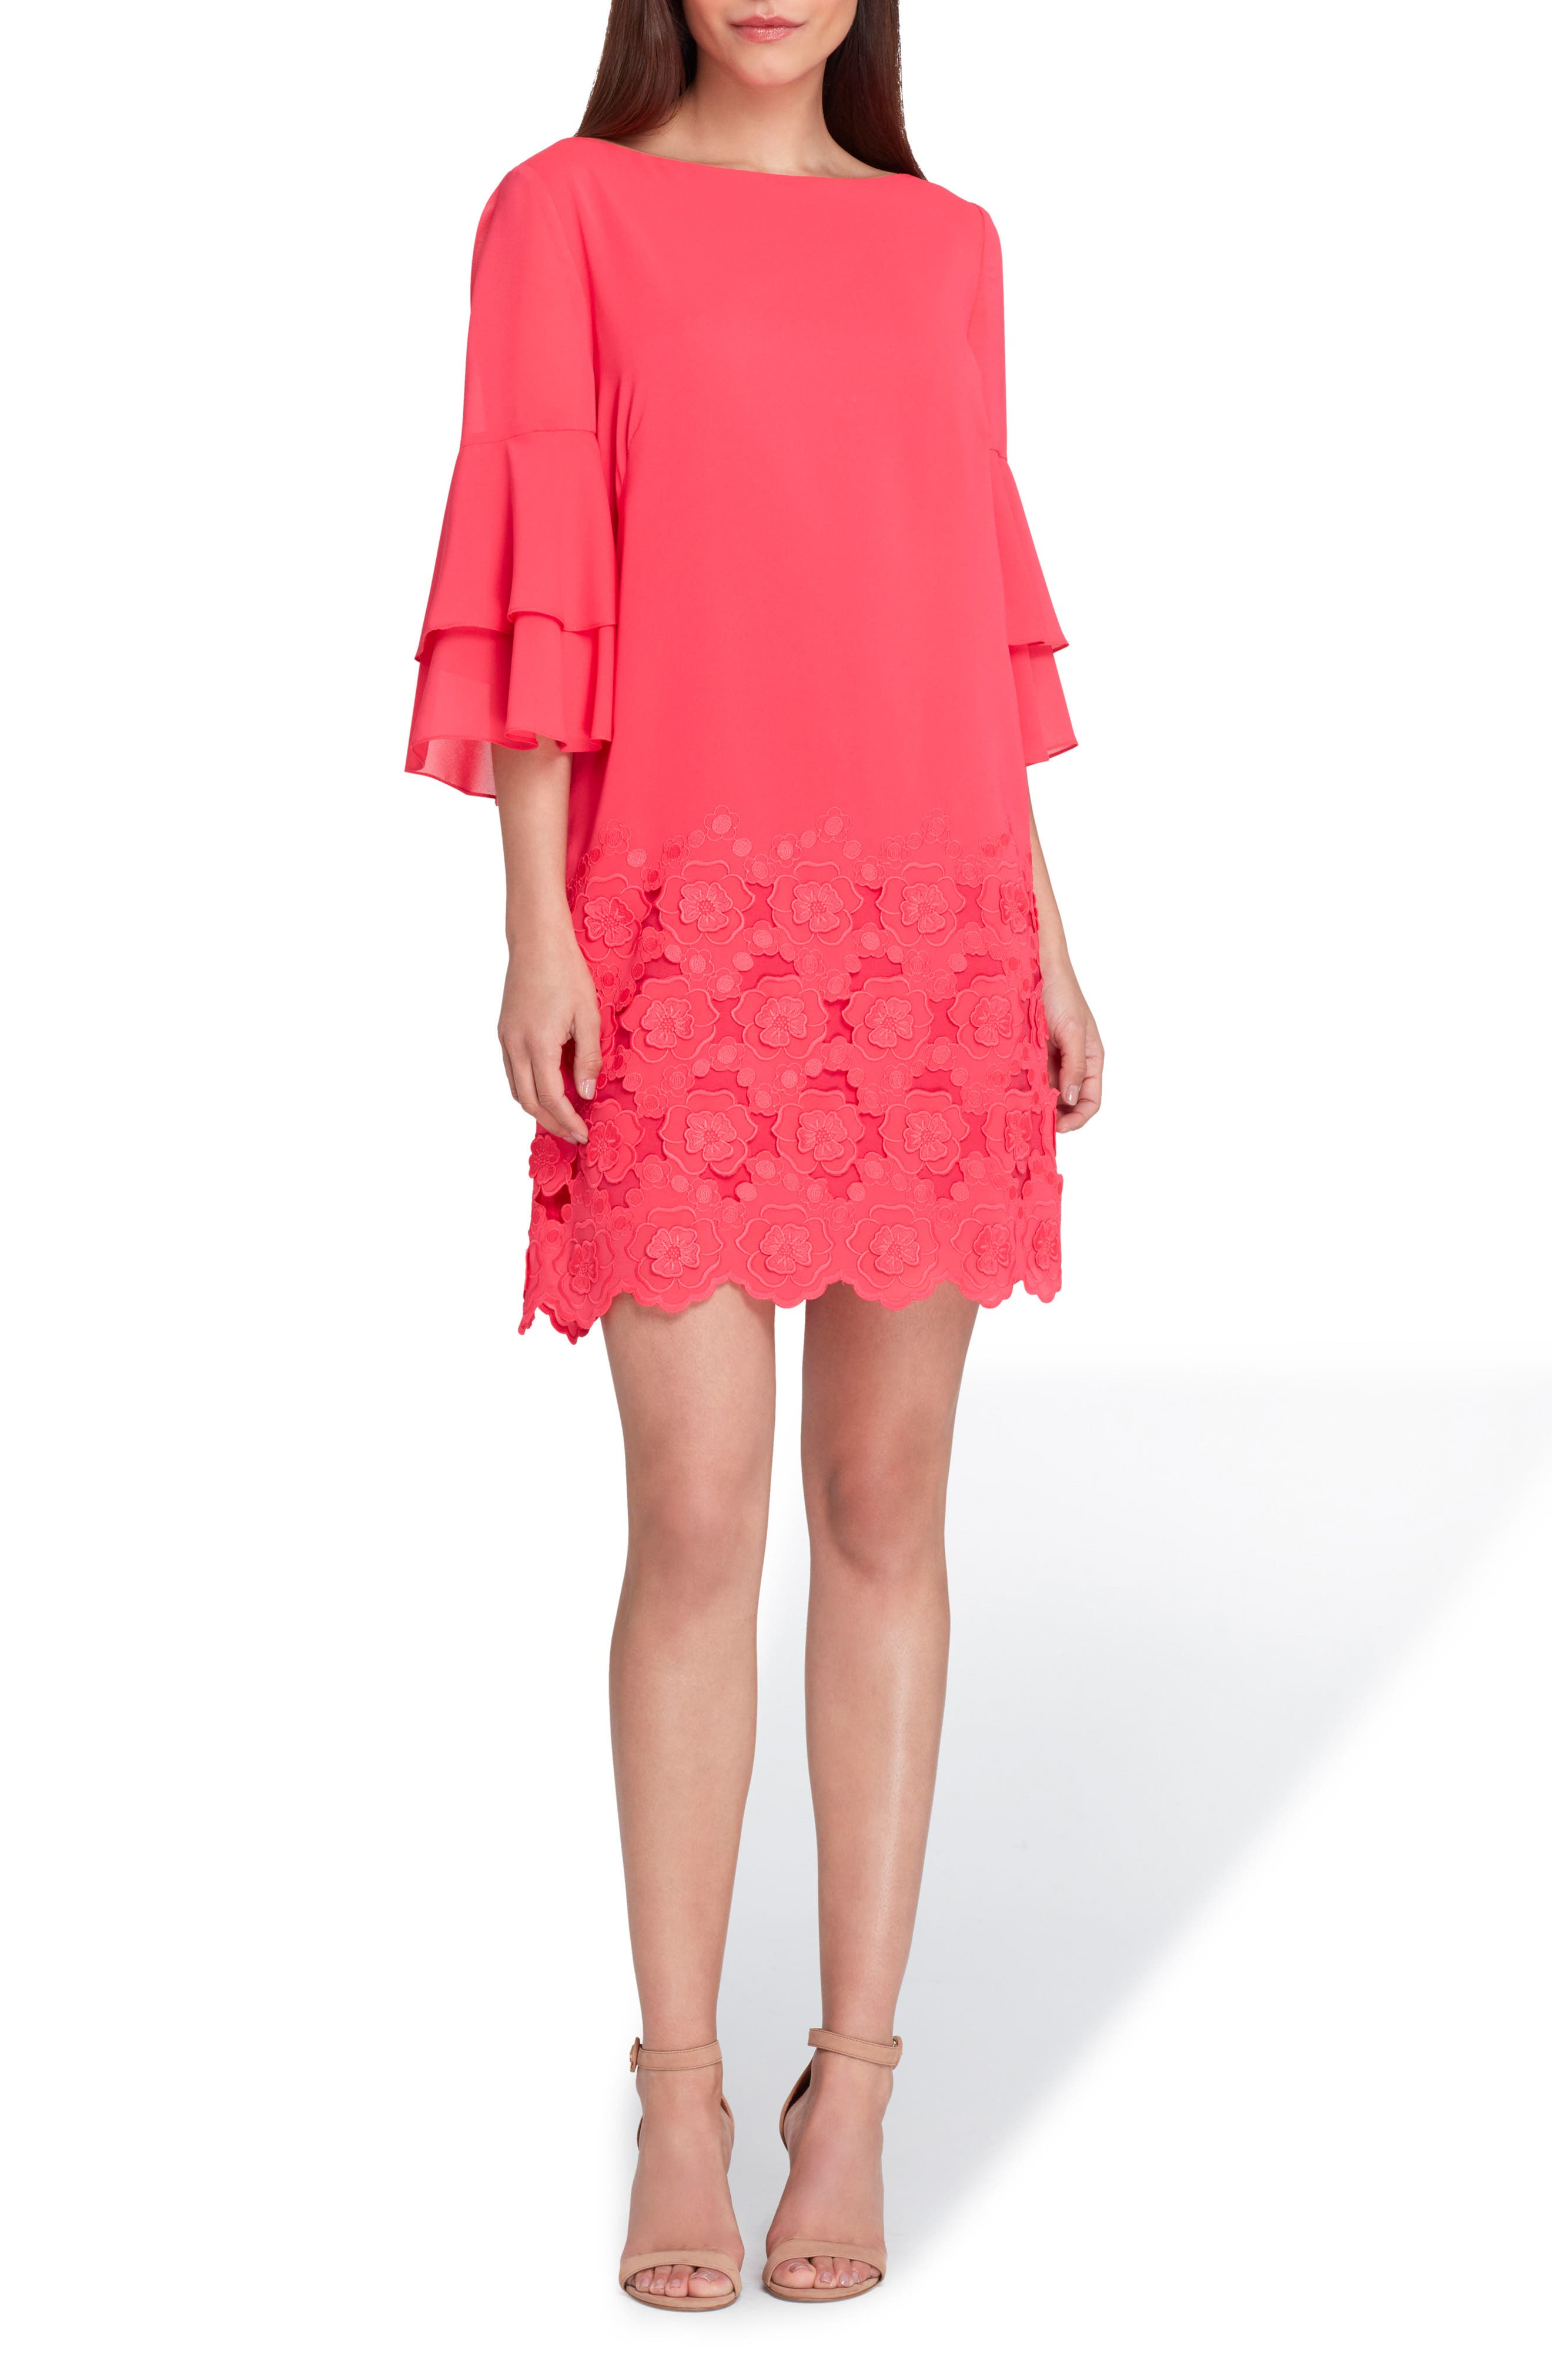 Embroidered Ruffle Sleeve Shift Dress,                             Main thumbnail 1, color,                             676